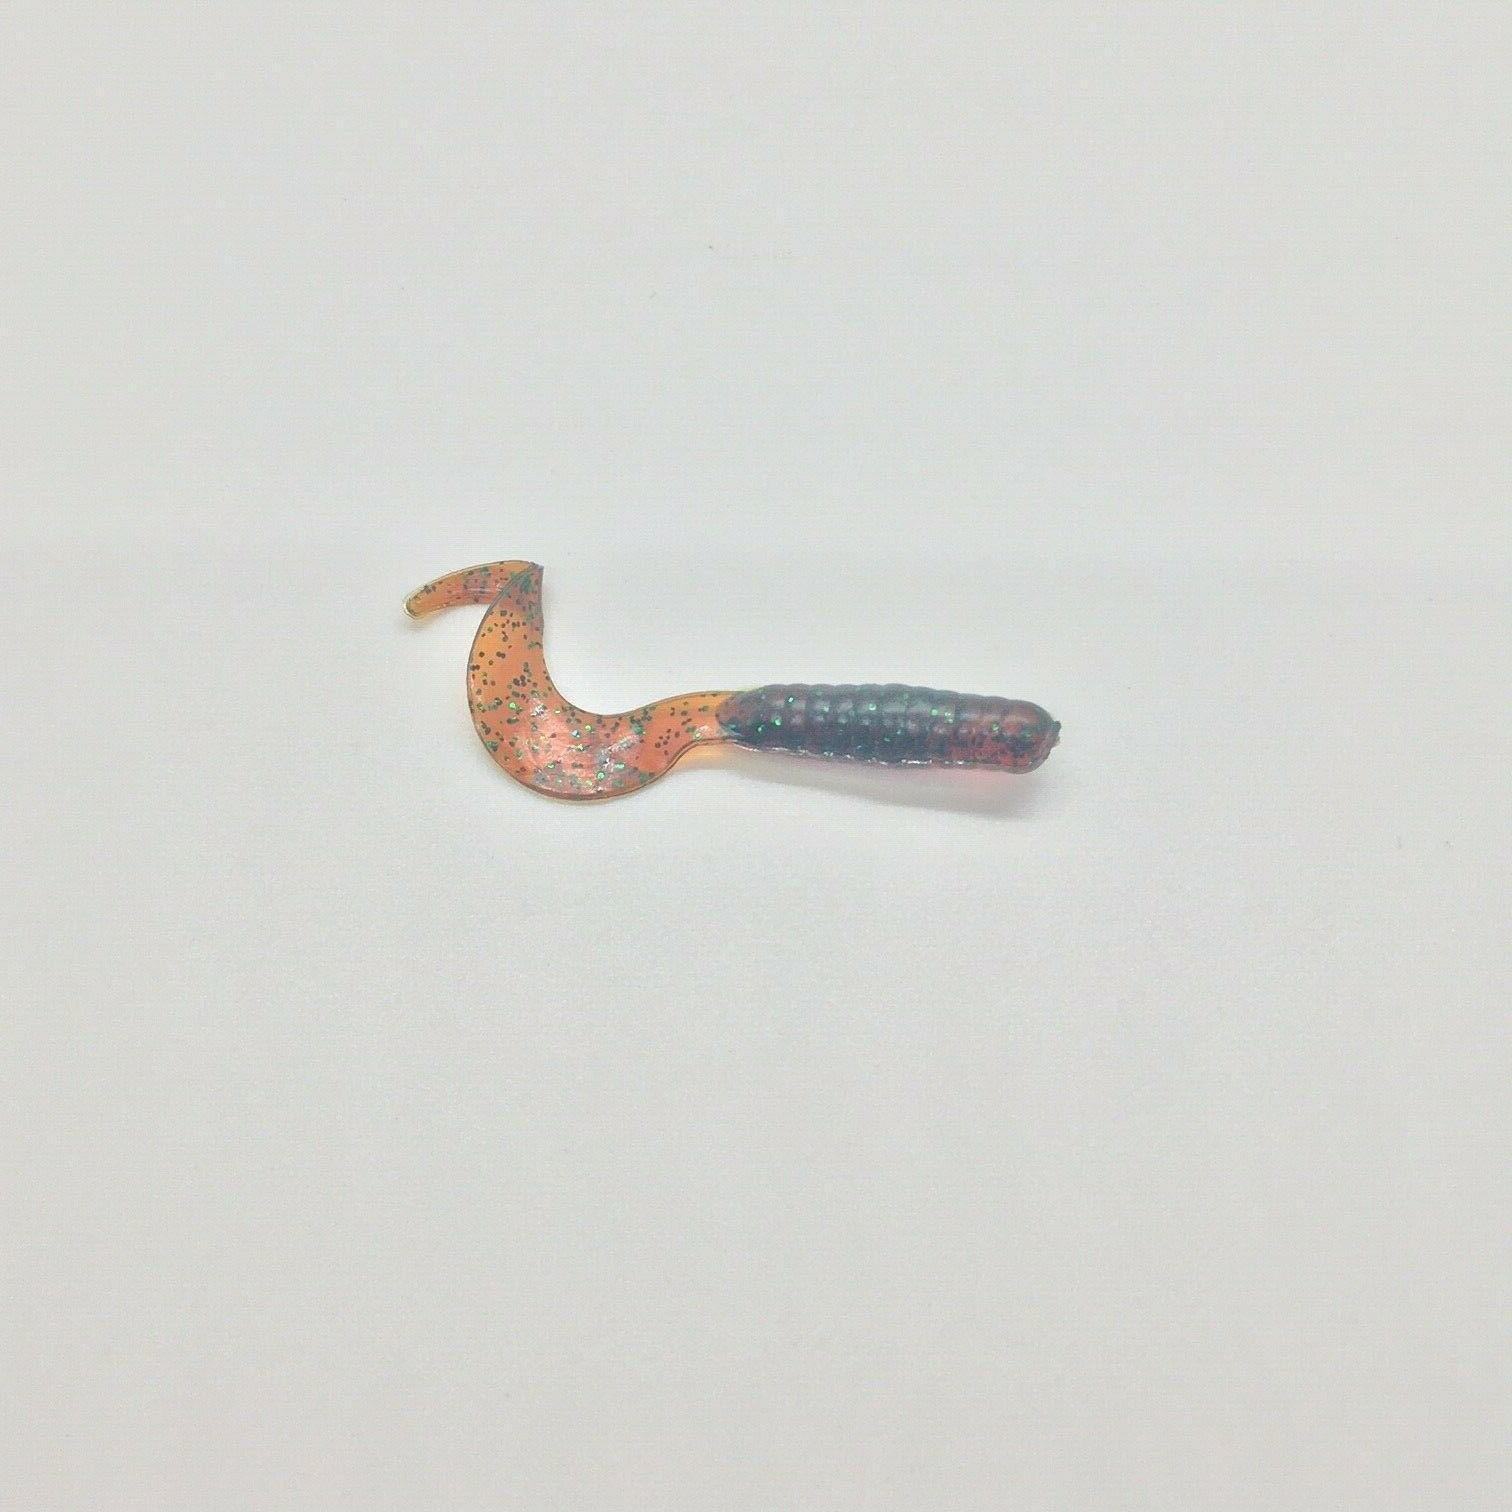 50ct Curly fishing worm plastics- 2 inch